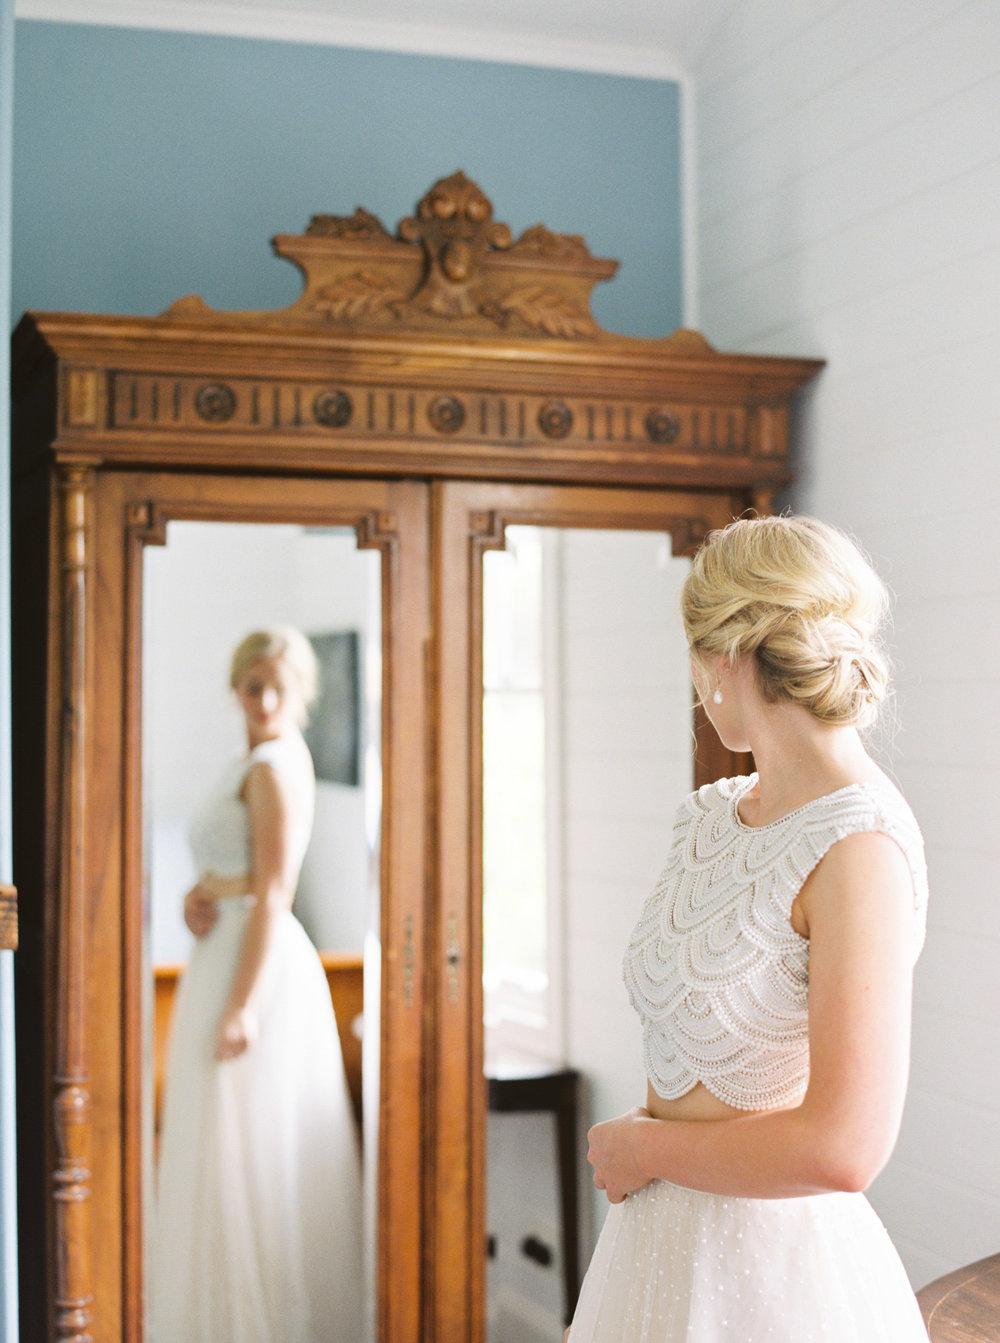 Timeless Southern Highland Wedding Elopement in Bowral NSW Fine Art Film Photographer Sheri McMahon-8.jpg